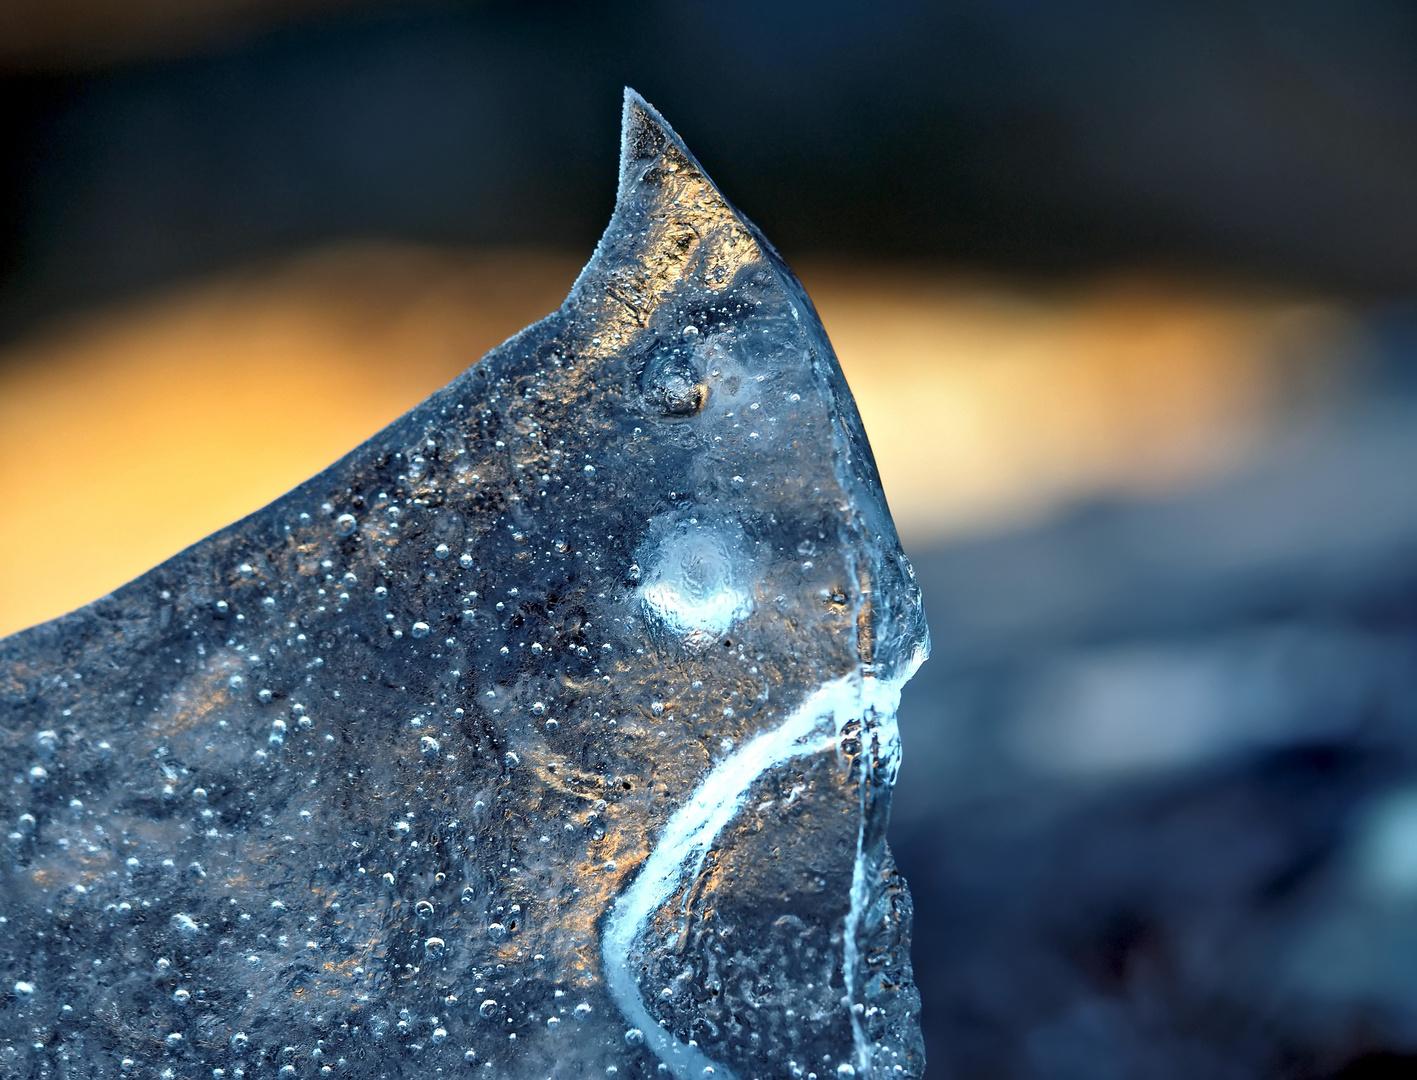 Mini Natur-Eis-Feuerwerk! * - Mini feu d'artifice fait de glace!